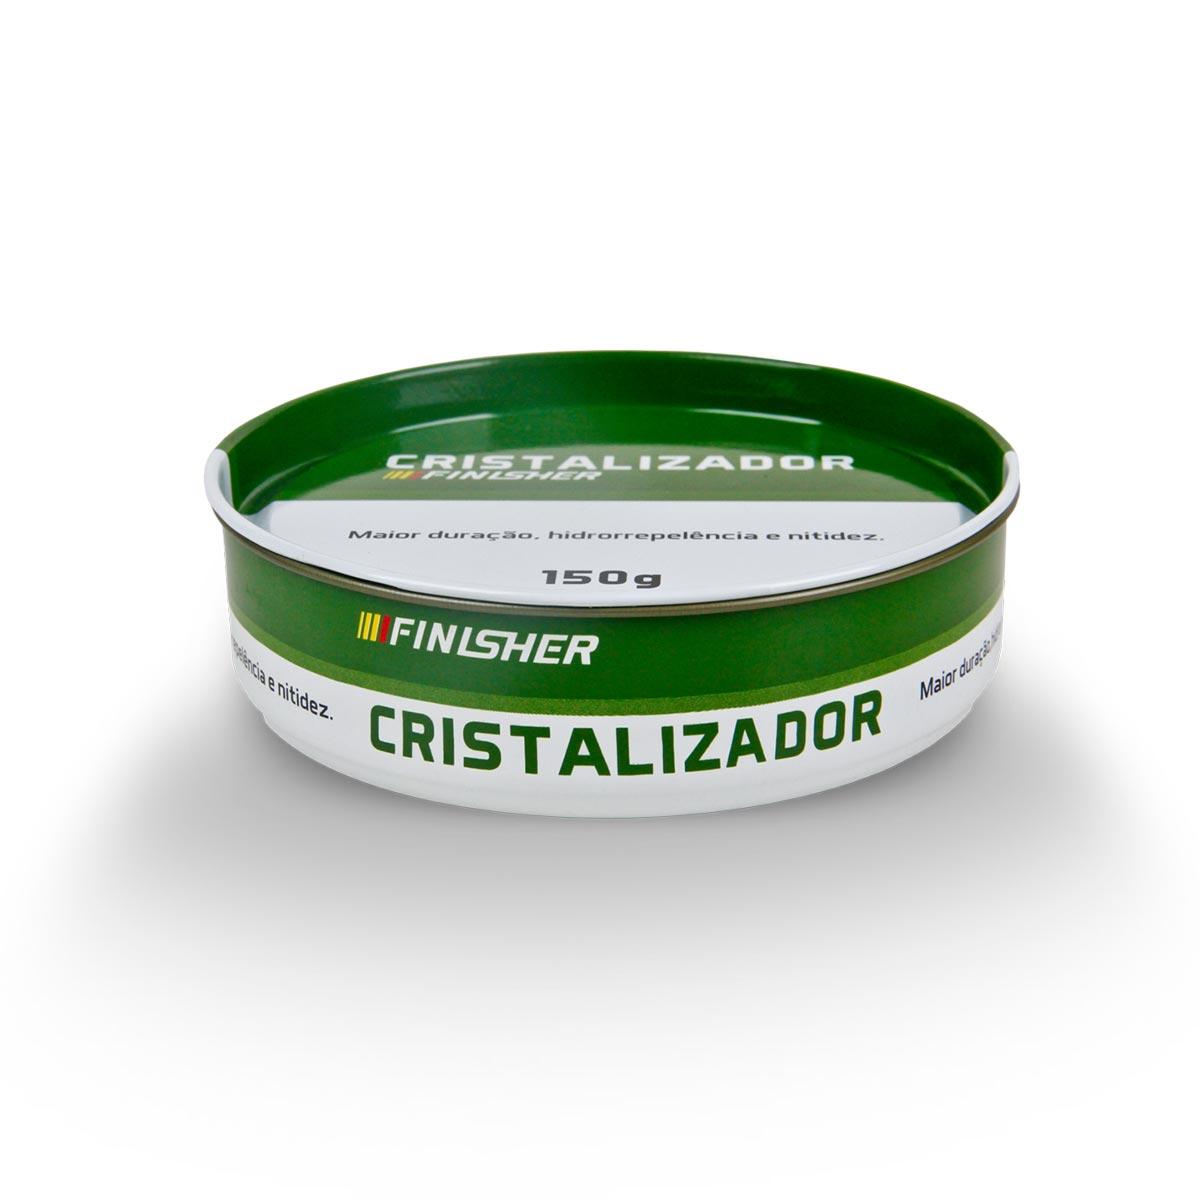 Cristalizador 150g Finisher